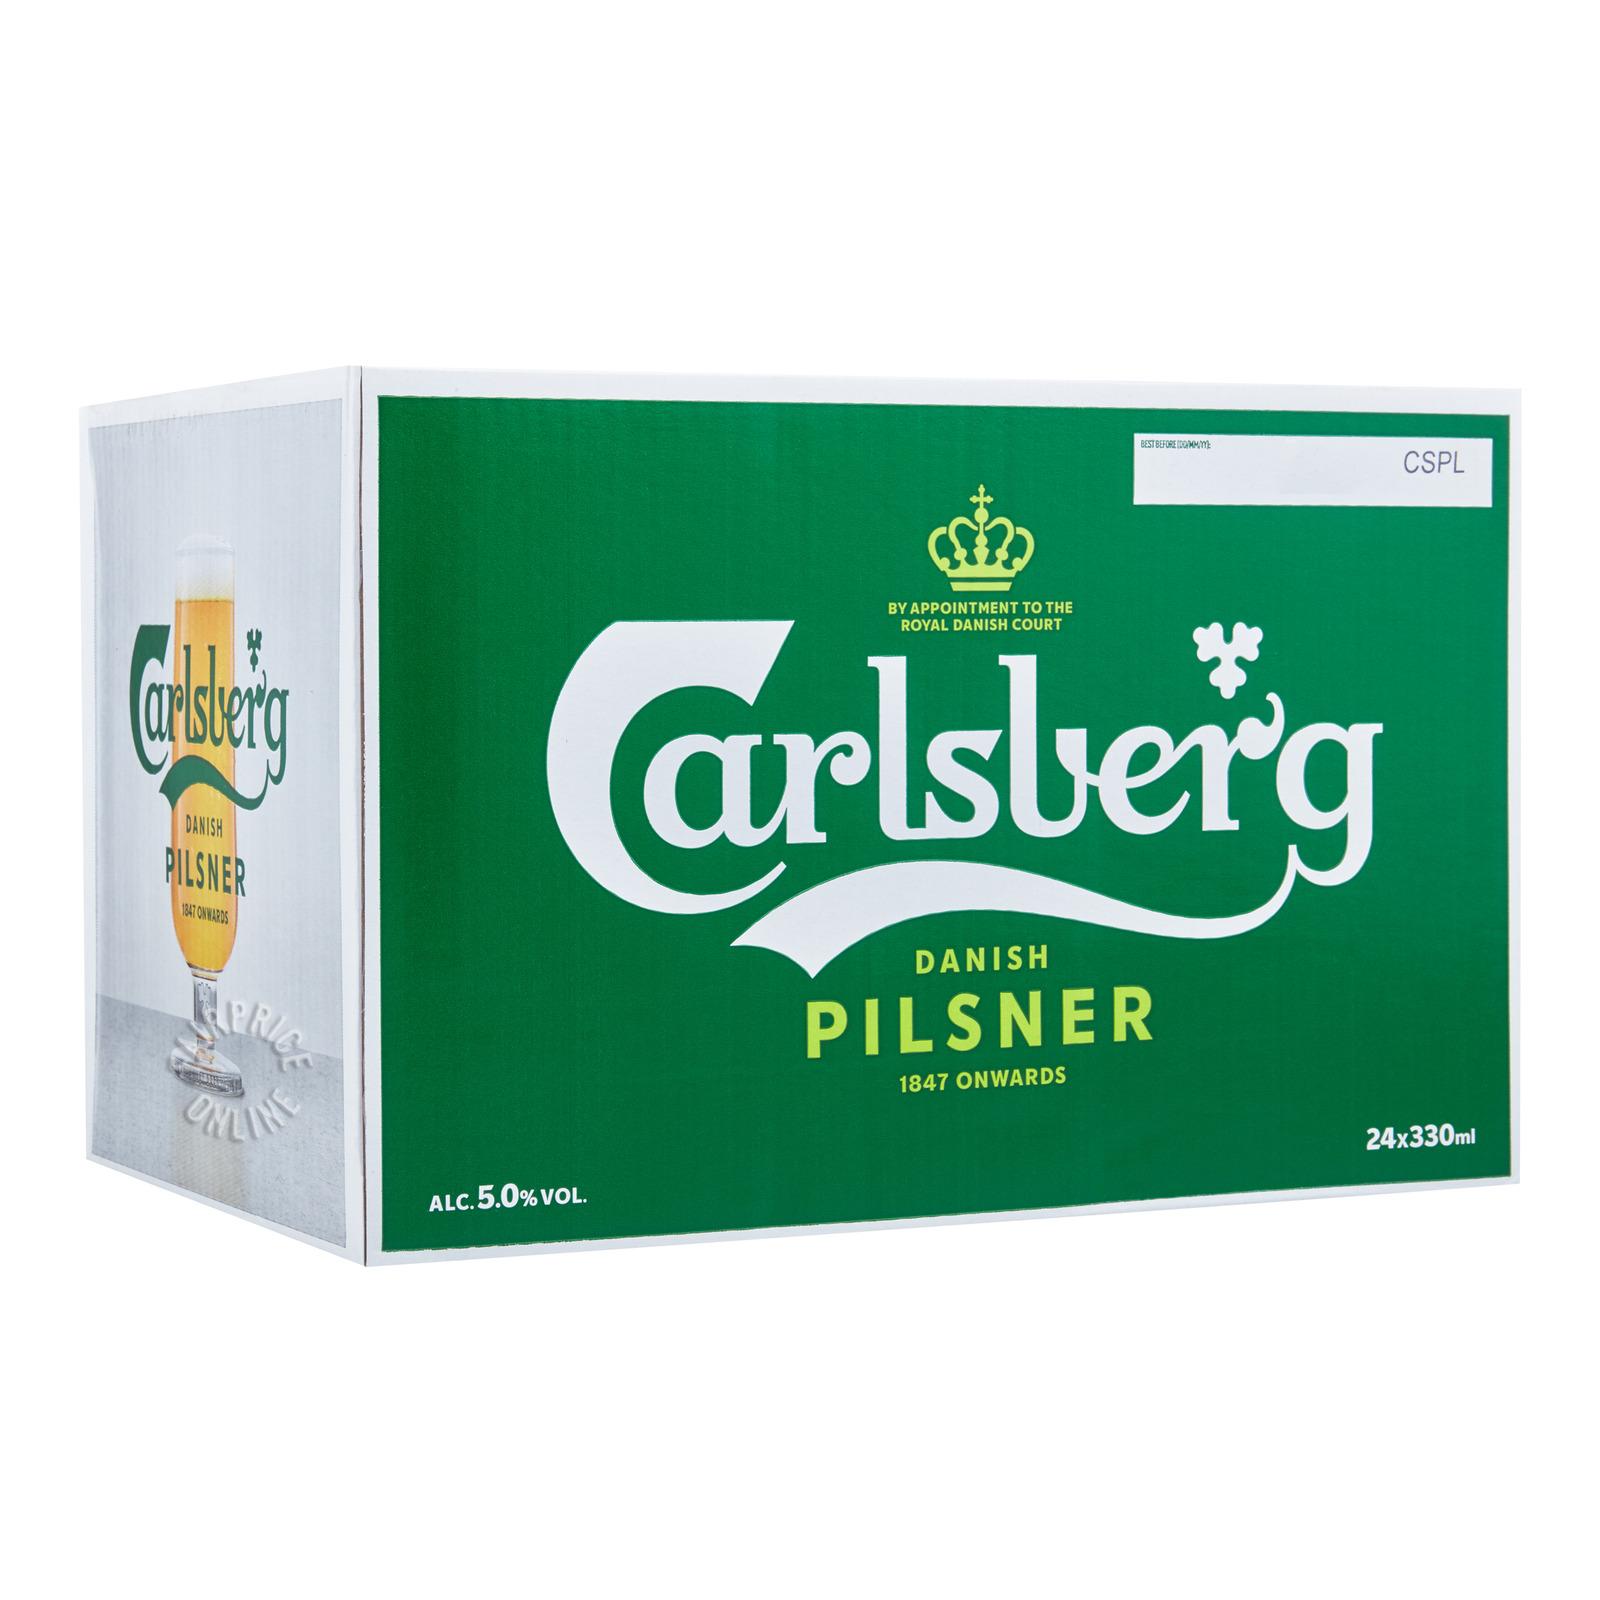 Carlsberg Bottle Beer - Green Label